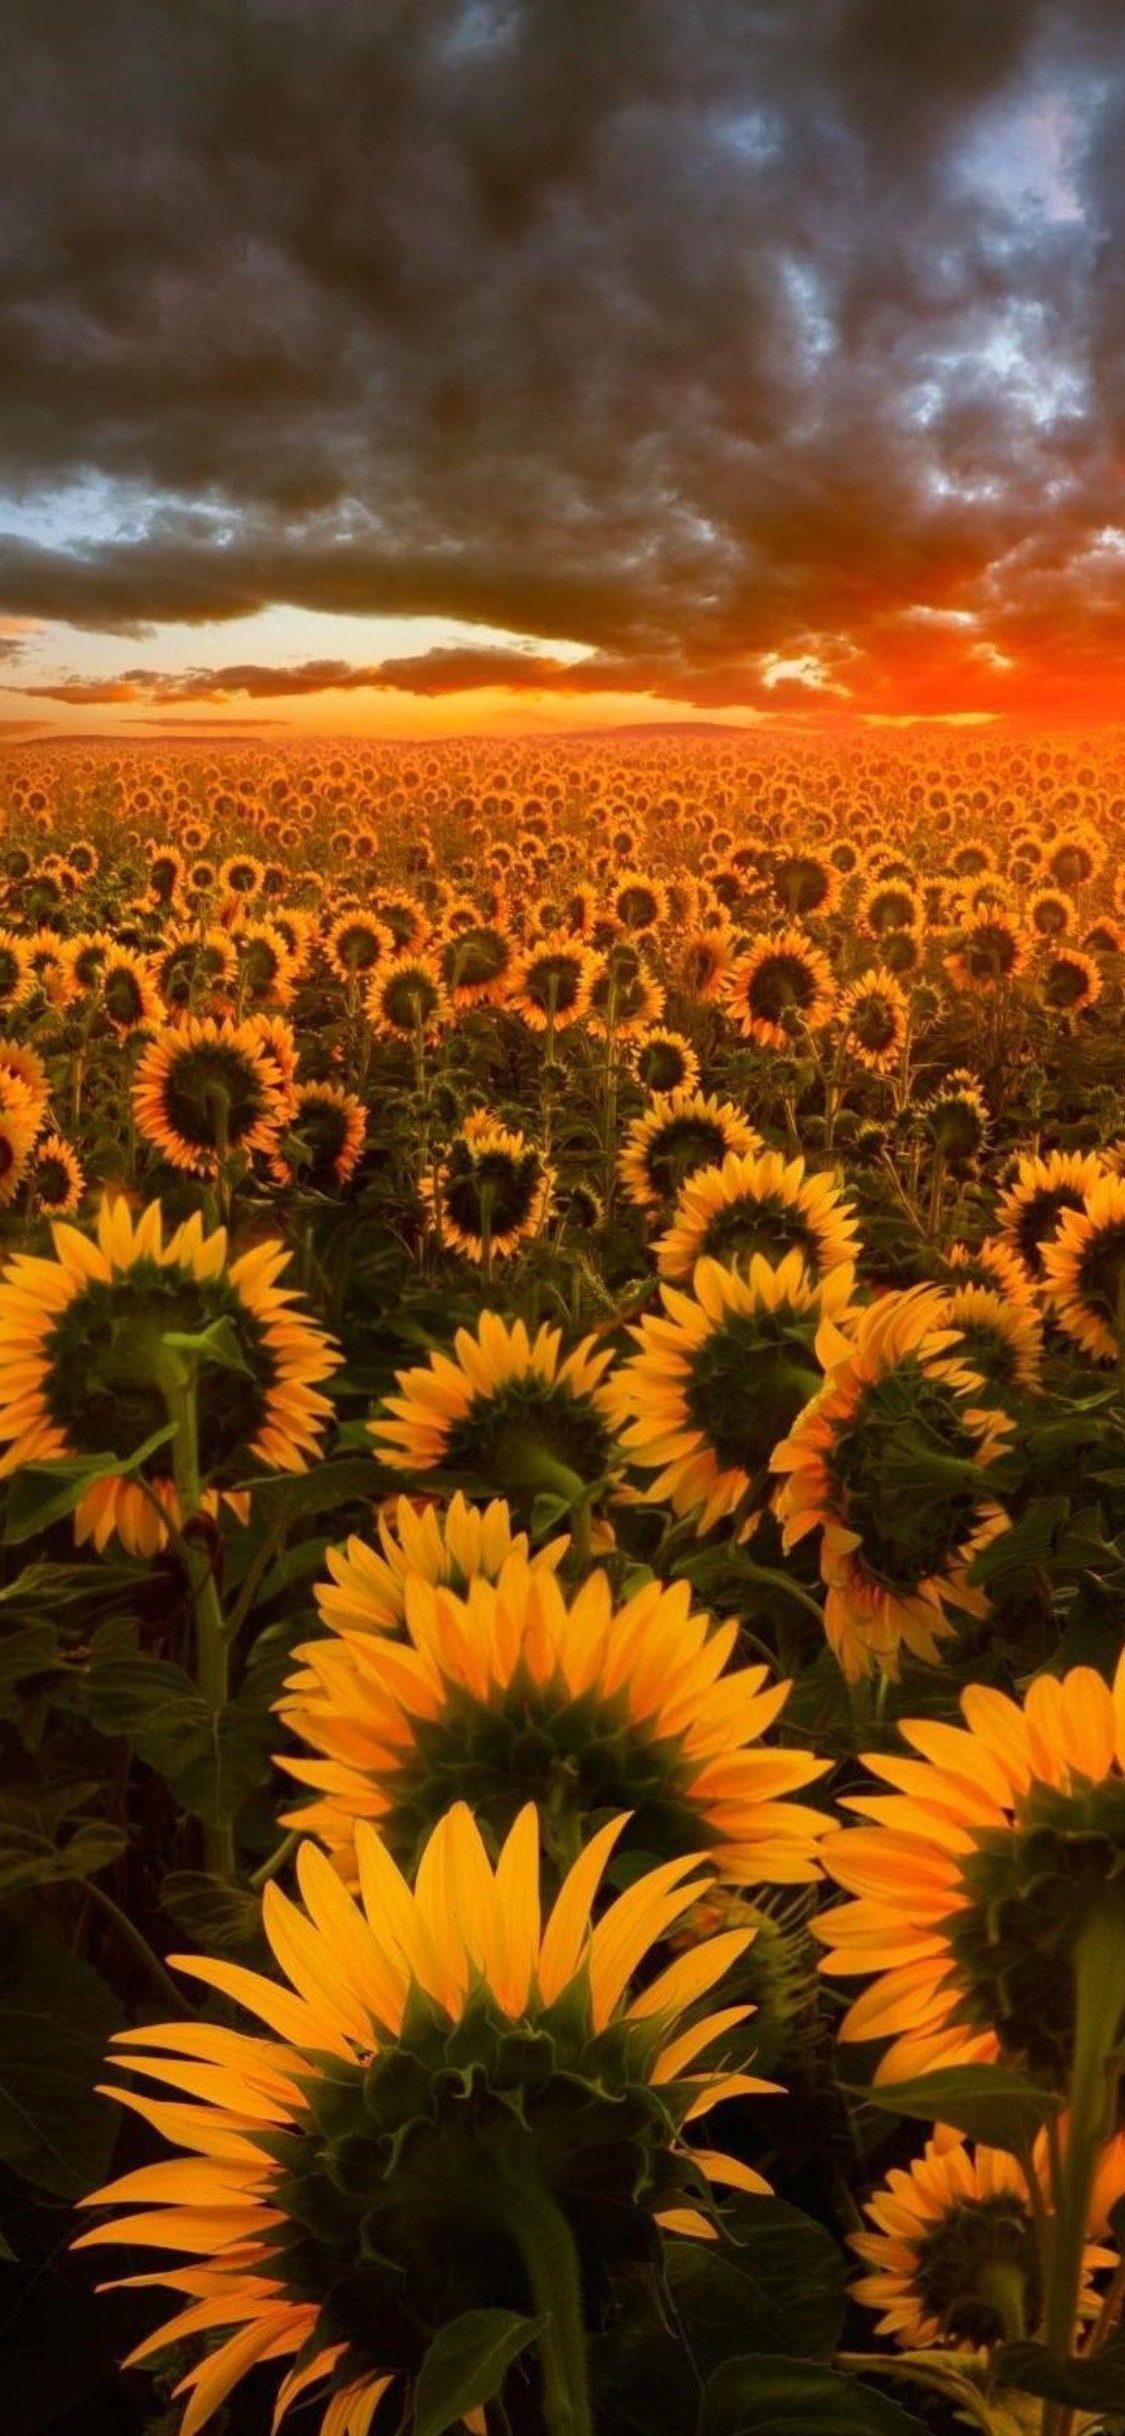 Sunflower Aesthetic Sunset Wallpapers - Wallpaper Cave